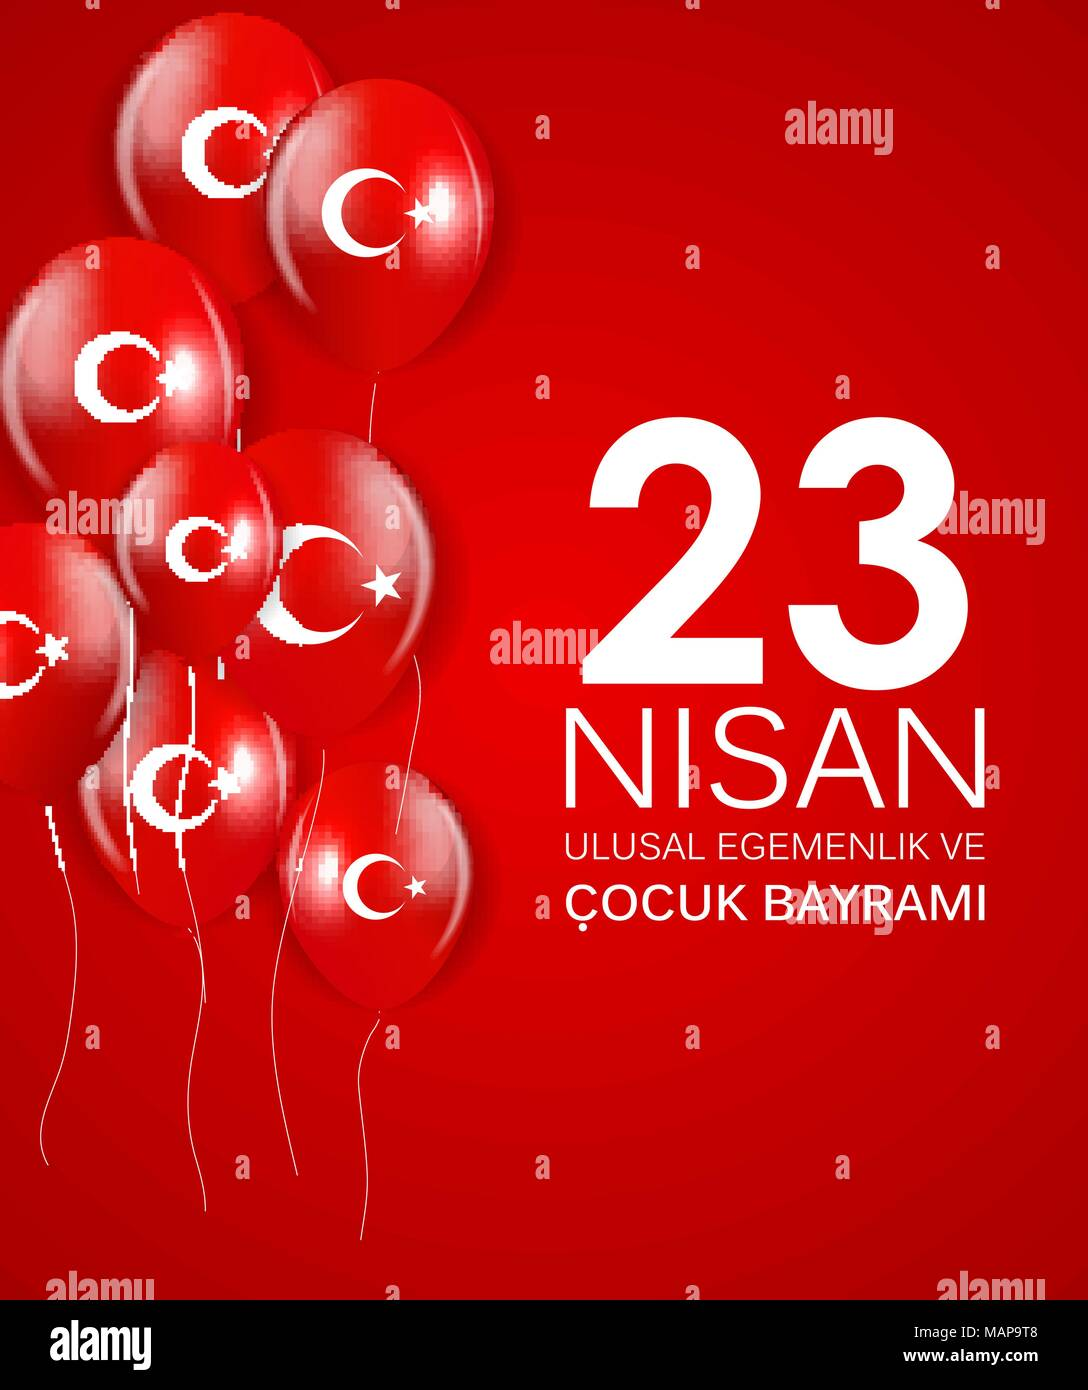 23 nisan cocuk baryrami. Translation: Turkish April 23 Childrens Day Vector Illustration - Stock Vector